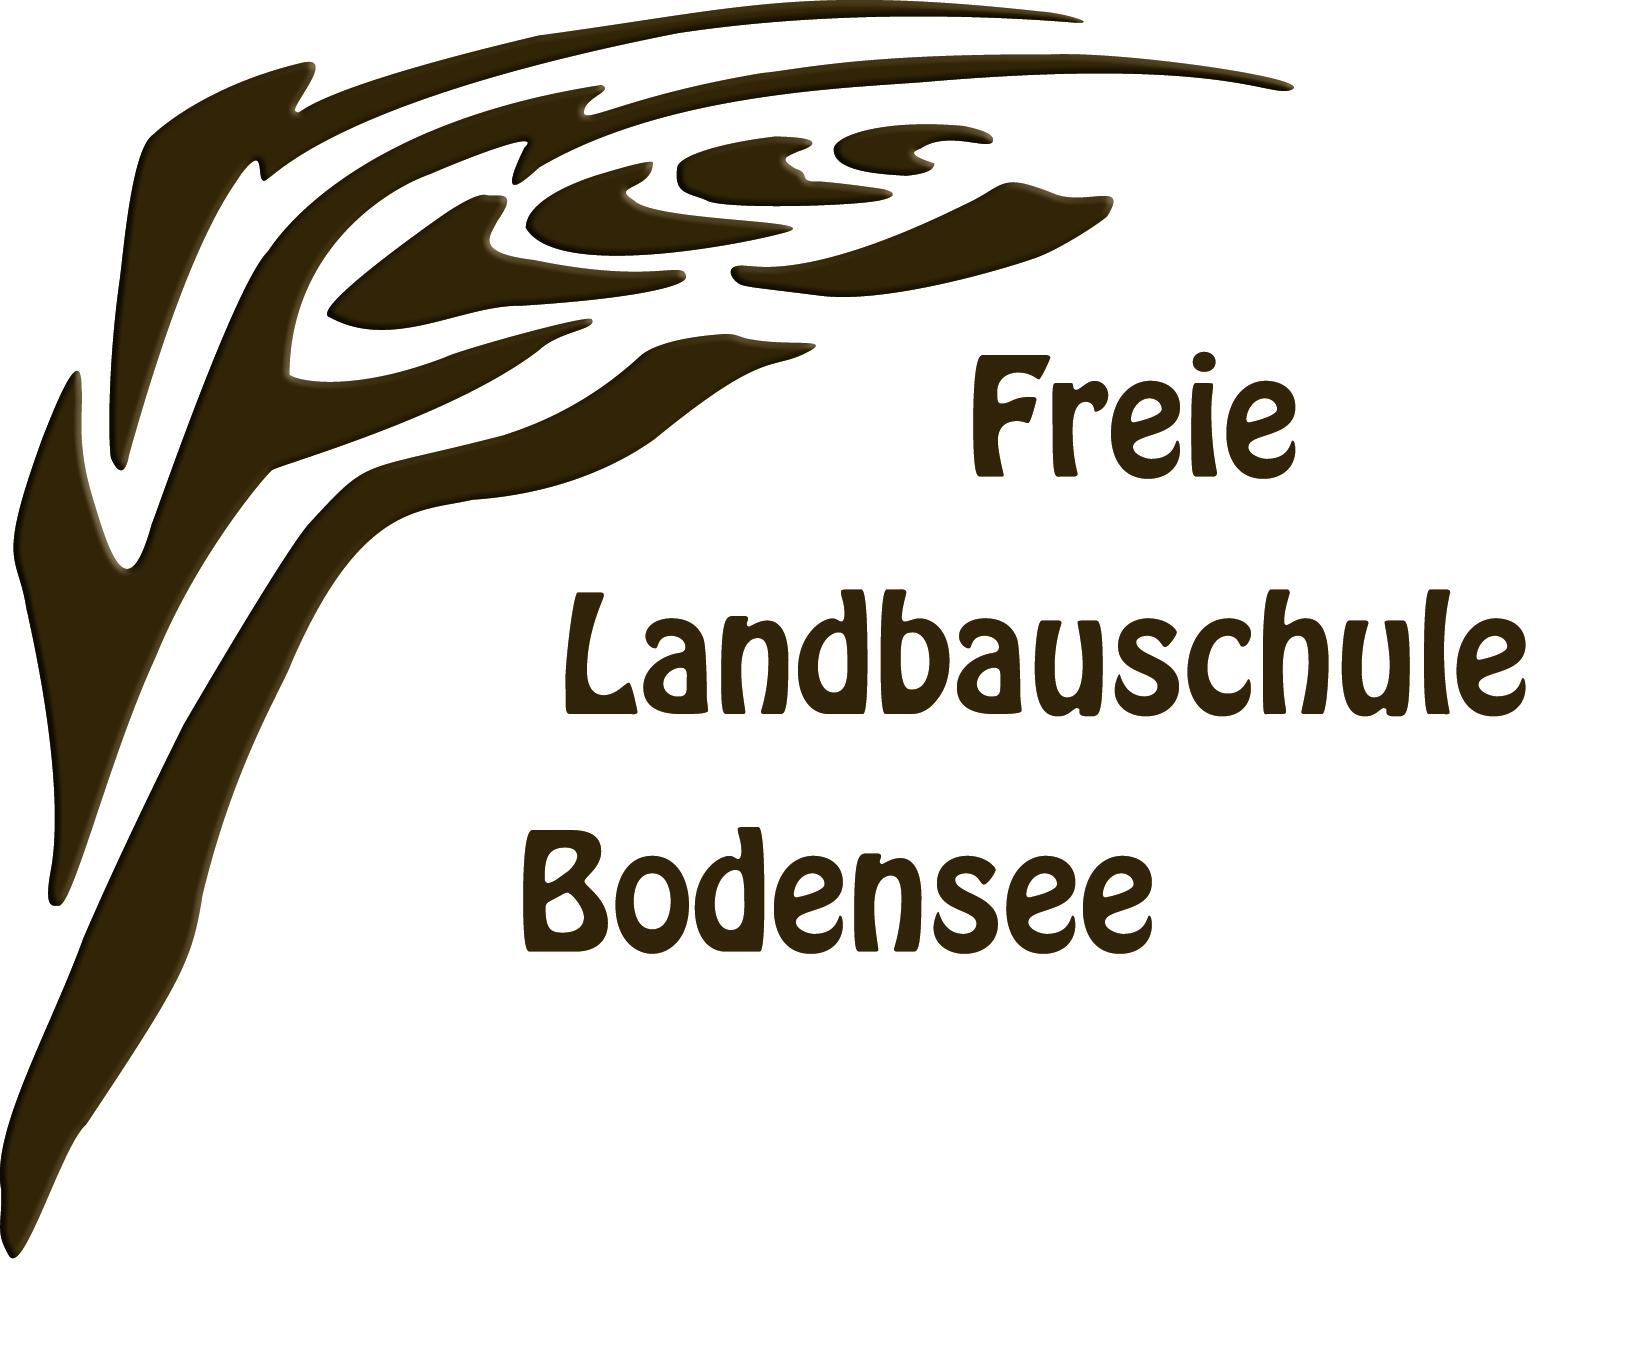 Logo Landbauschule Bodensee